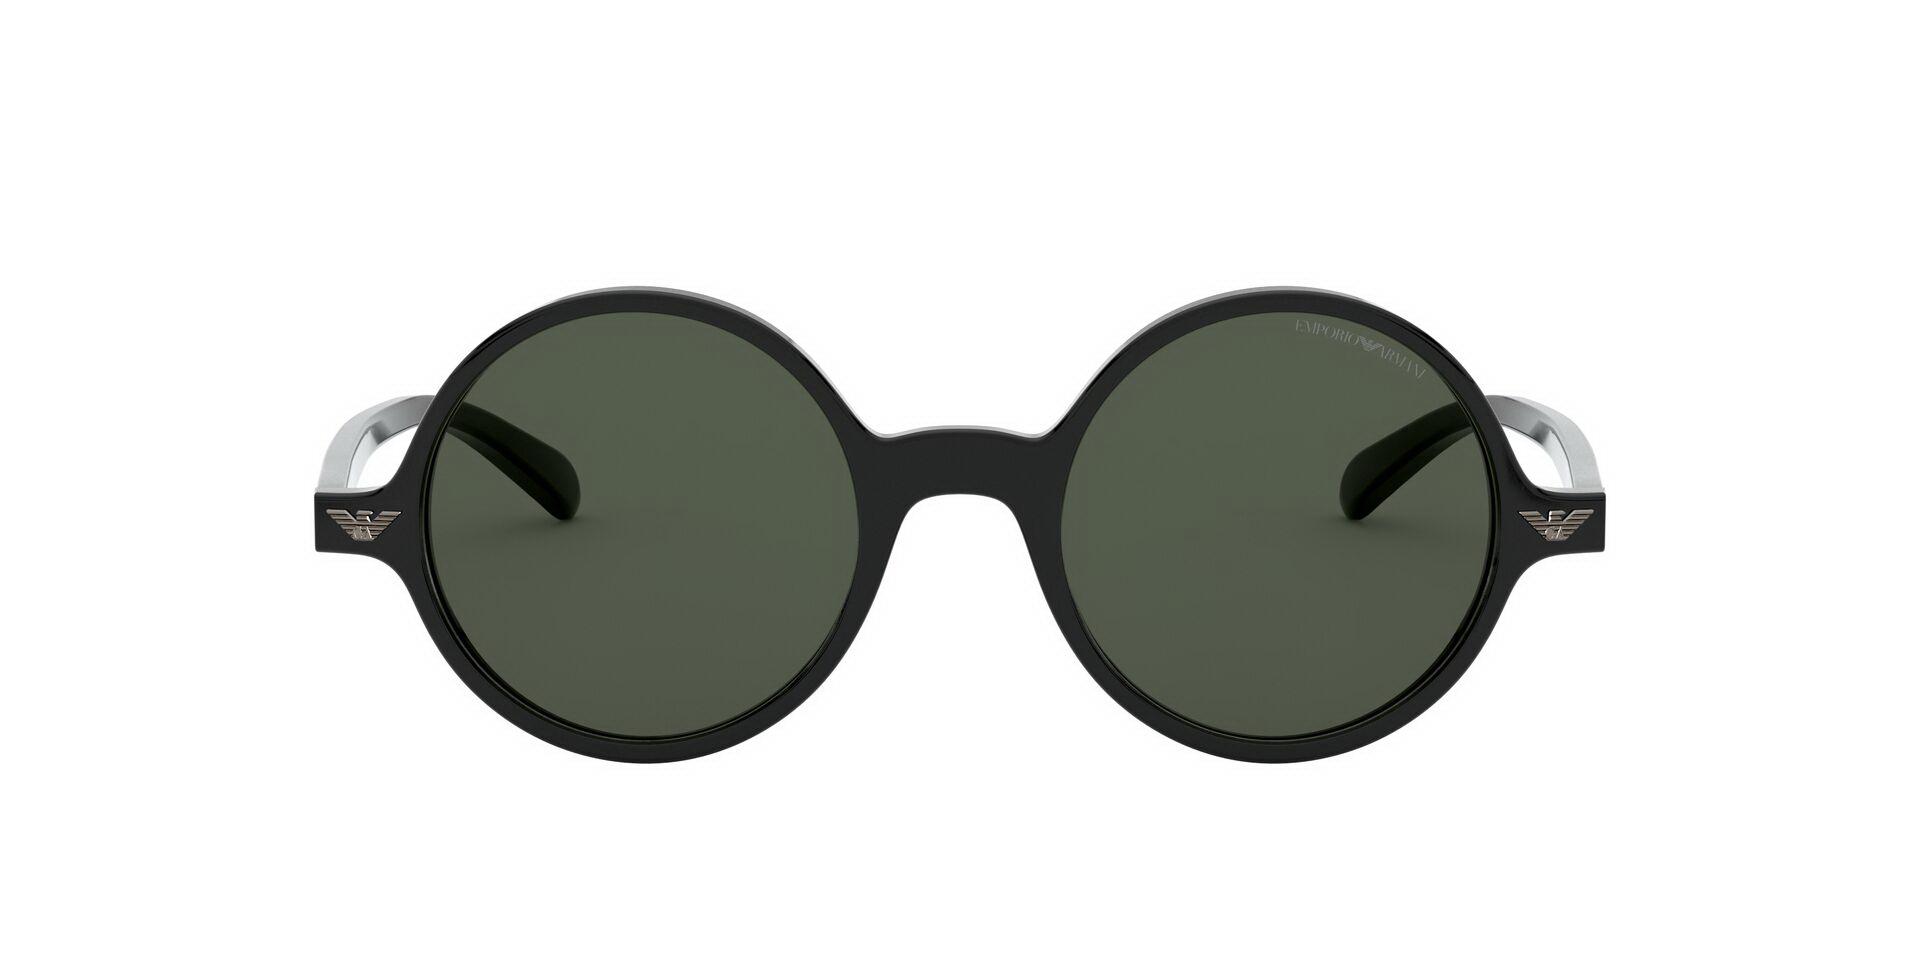 Солнцезащитные очки Очки с/з Emporio Armani 0EA 501M 500171 фото